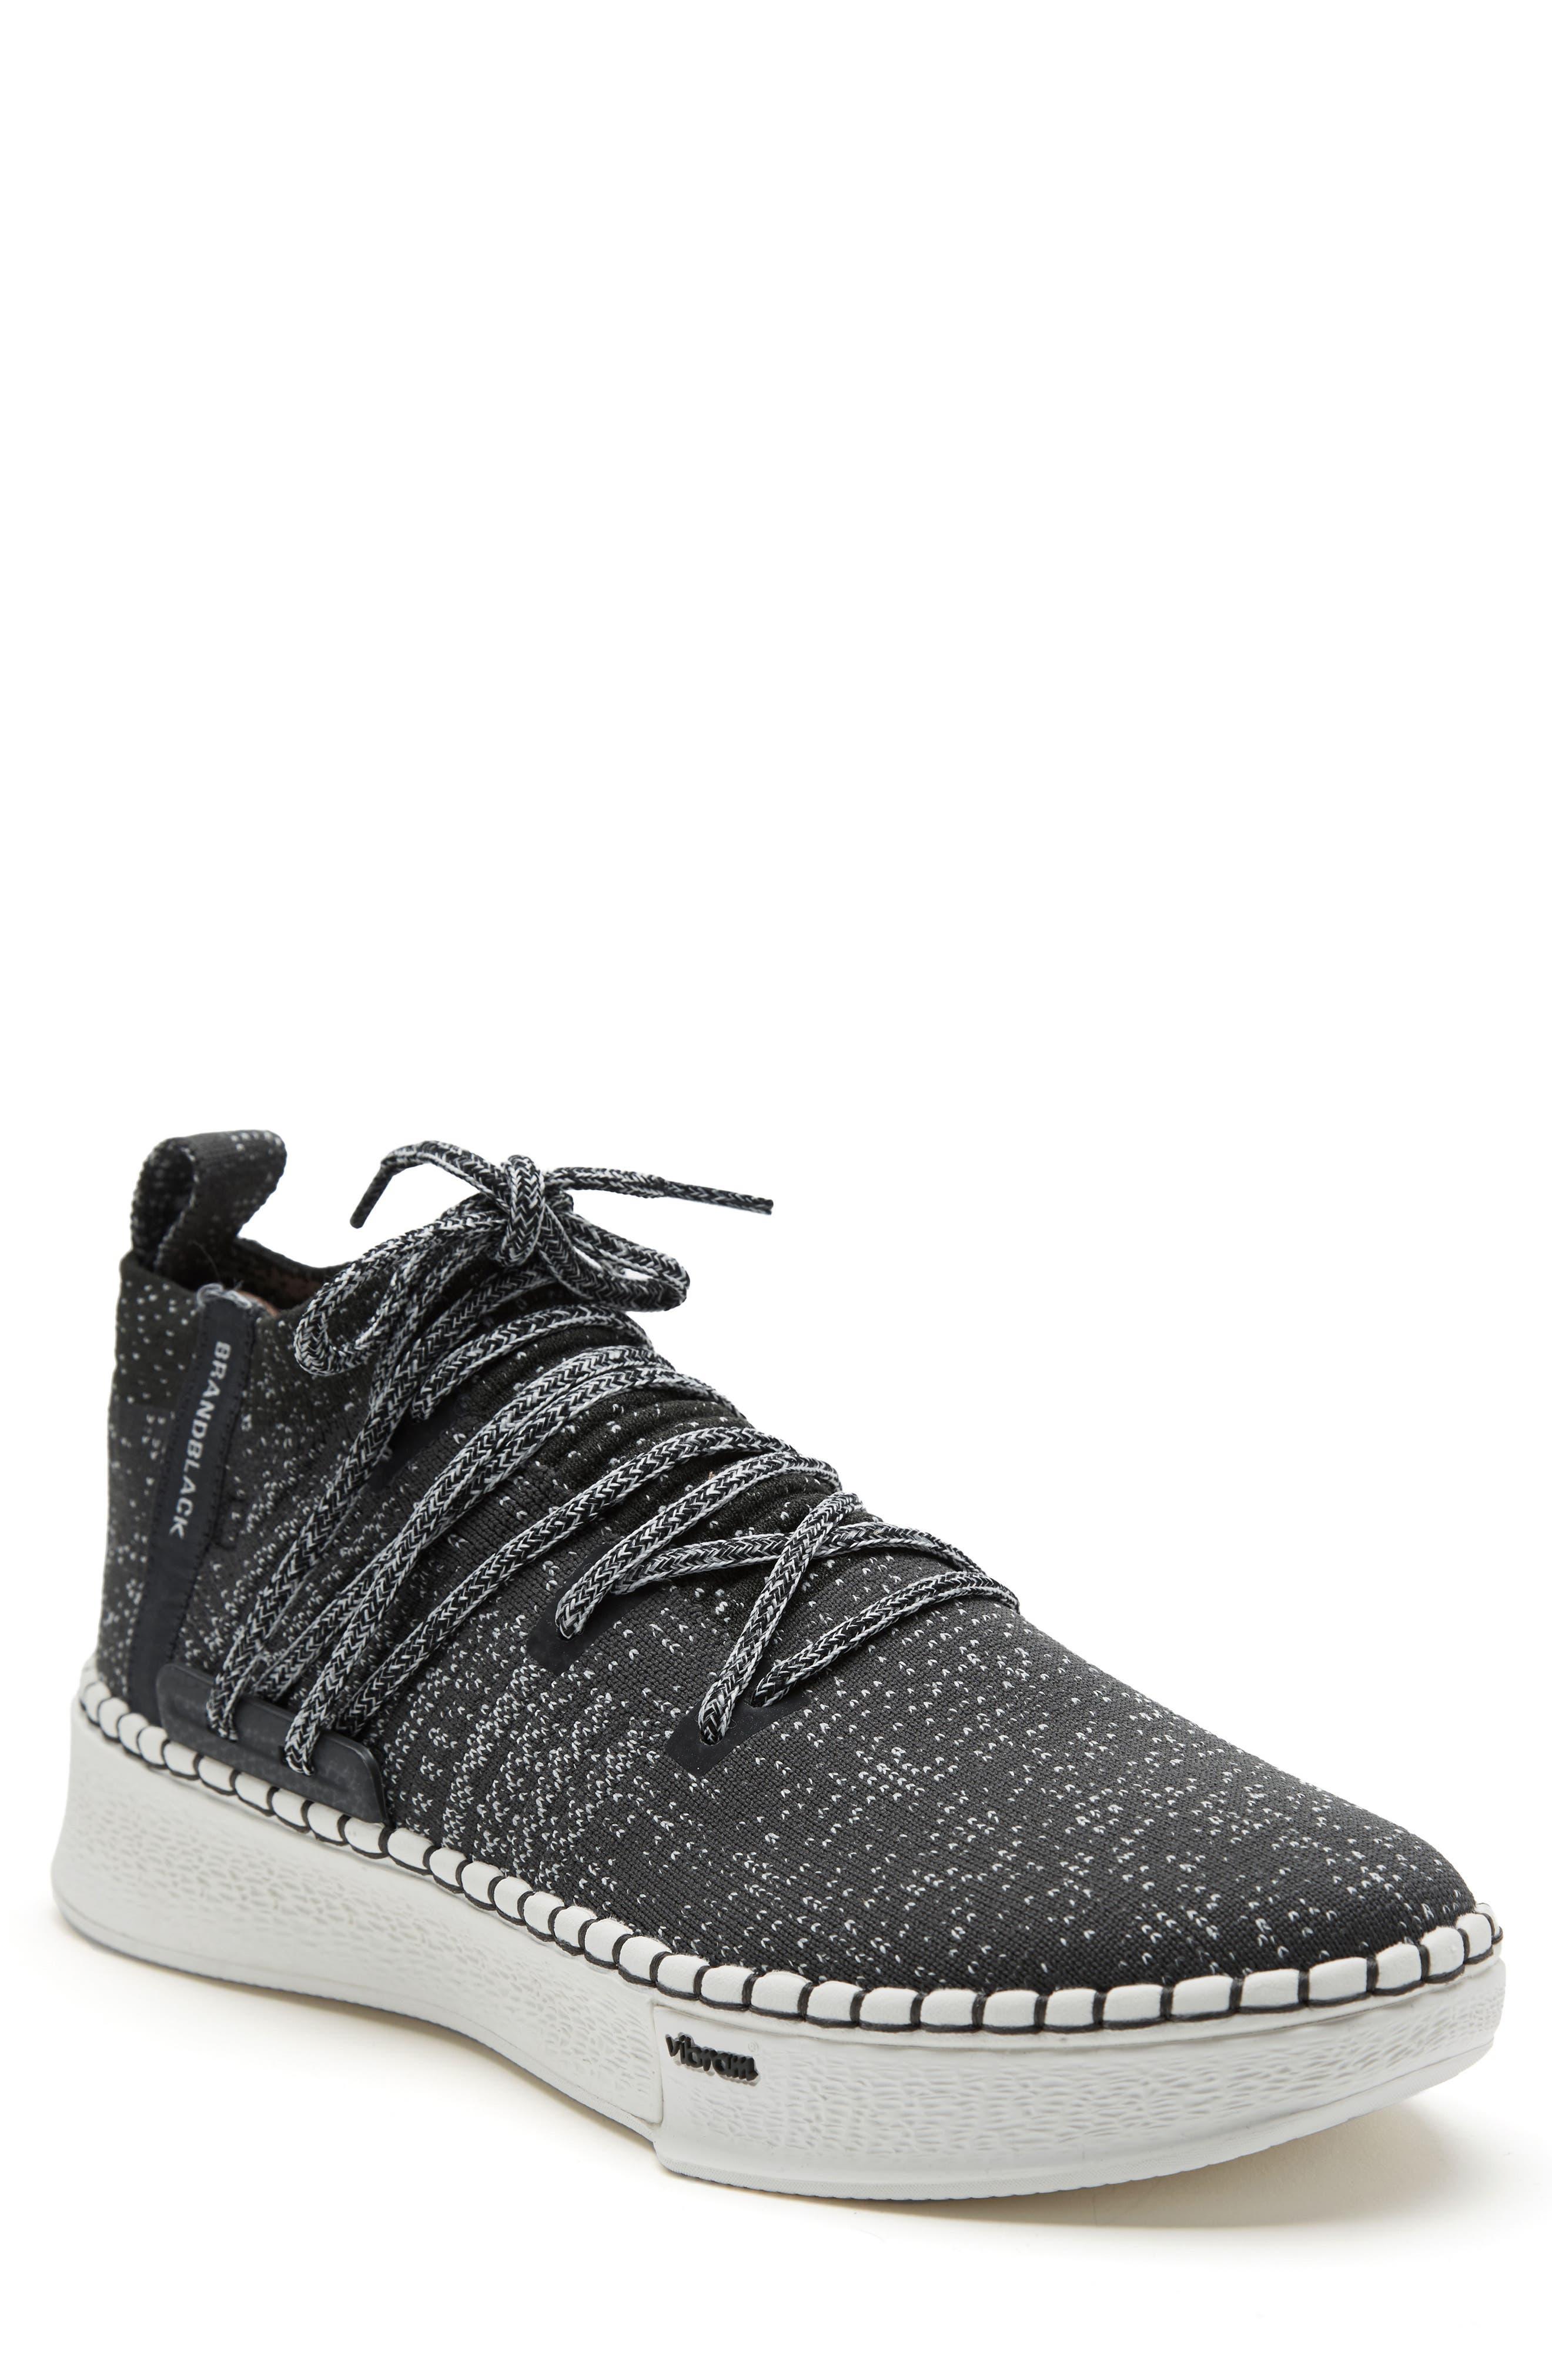 Delta Arrows Mid Top Knit Sneaker,                             Main thumbnail 1, color,                             BLACK/ WHITE